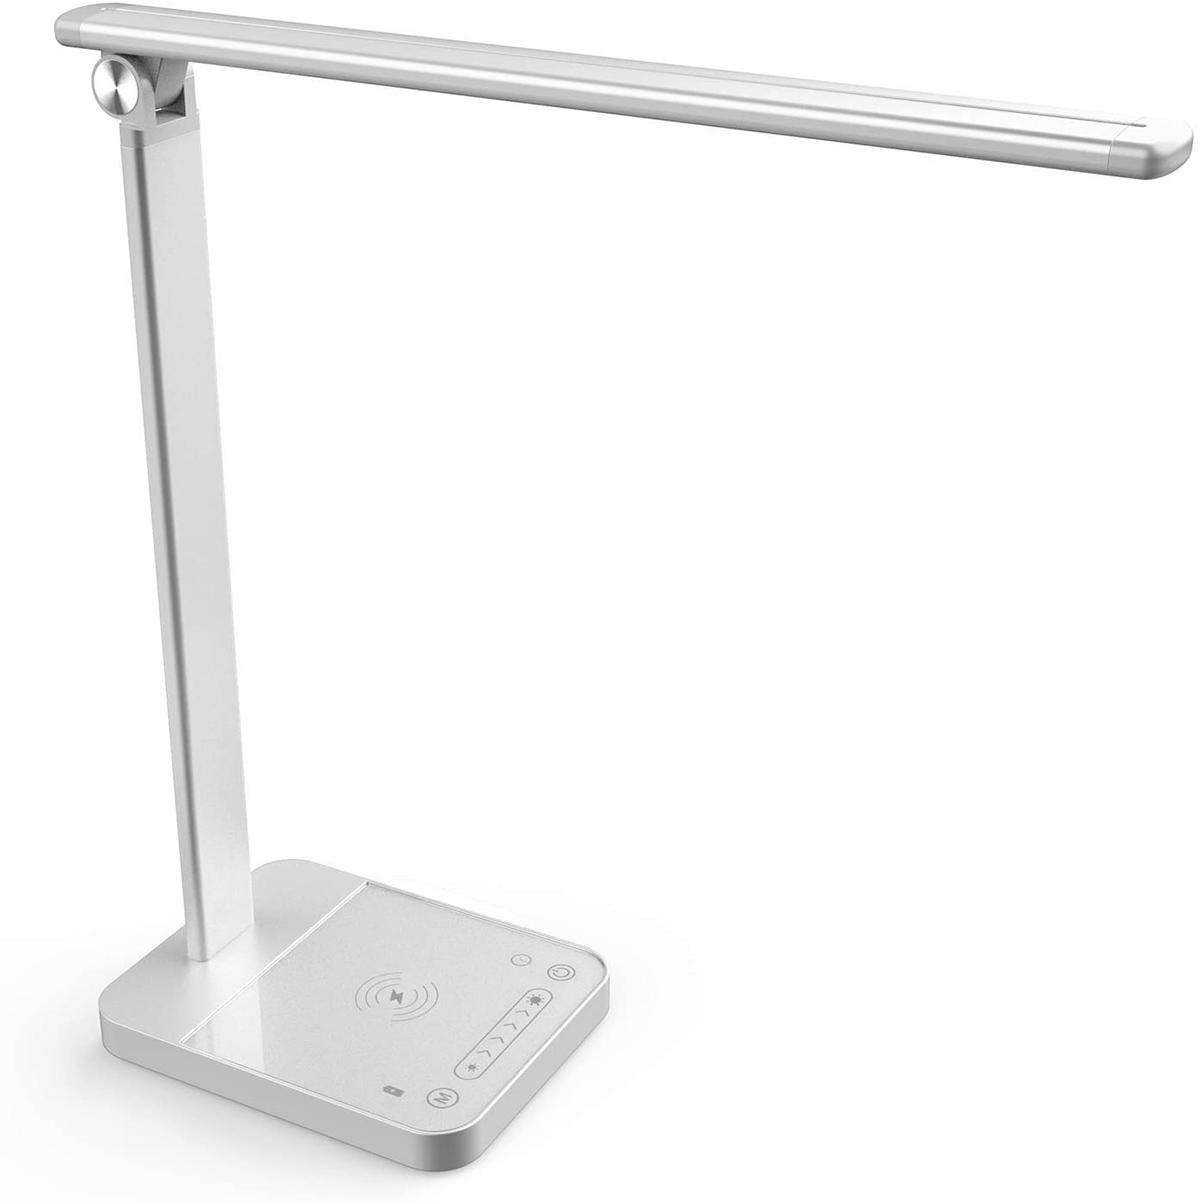 Luminaria Inteligente Napatek S61 Smart LED Desk Lamp